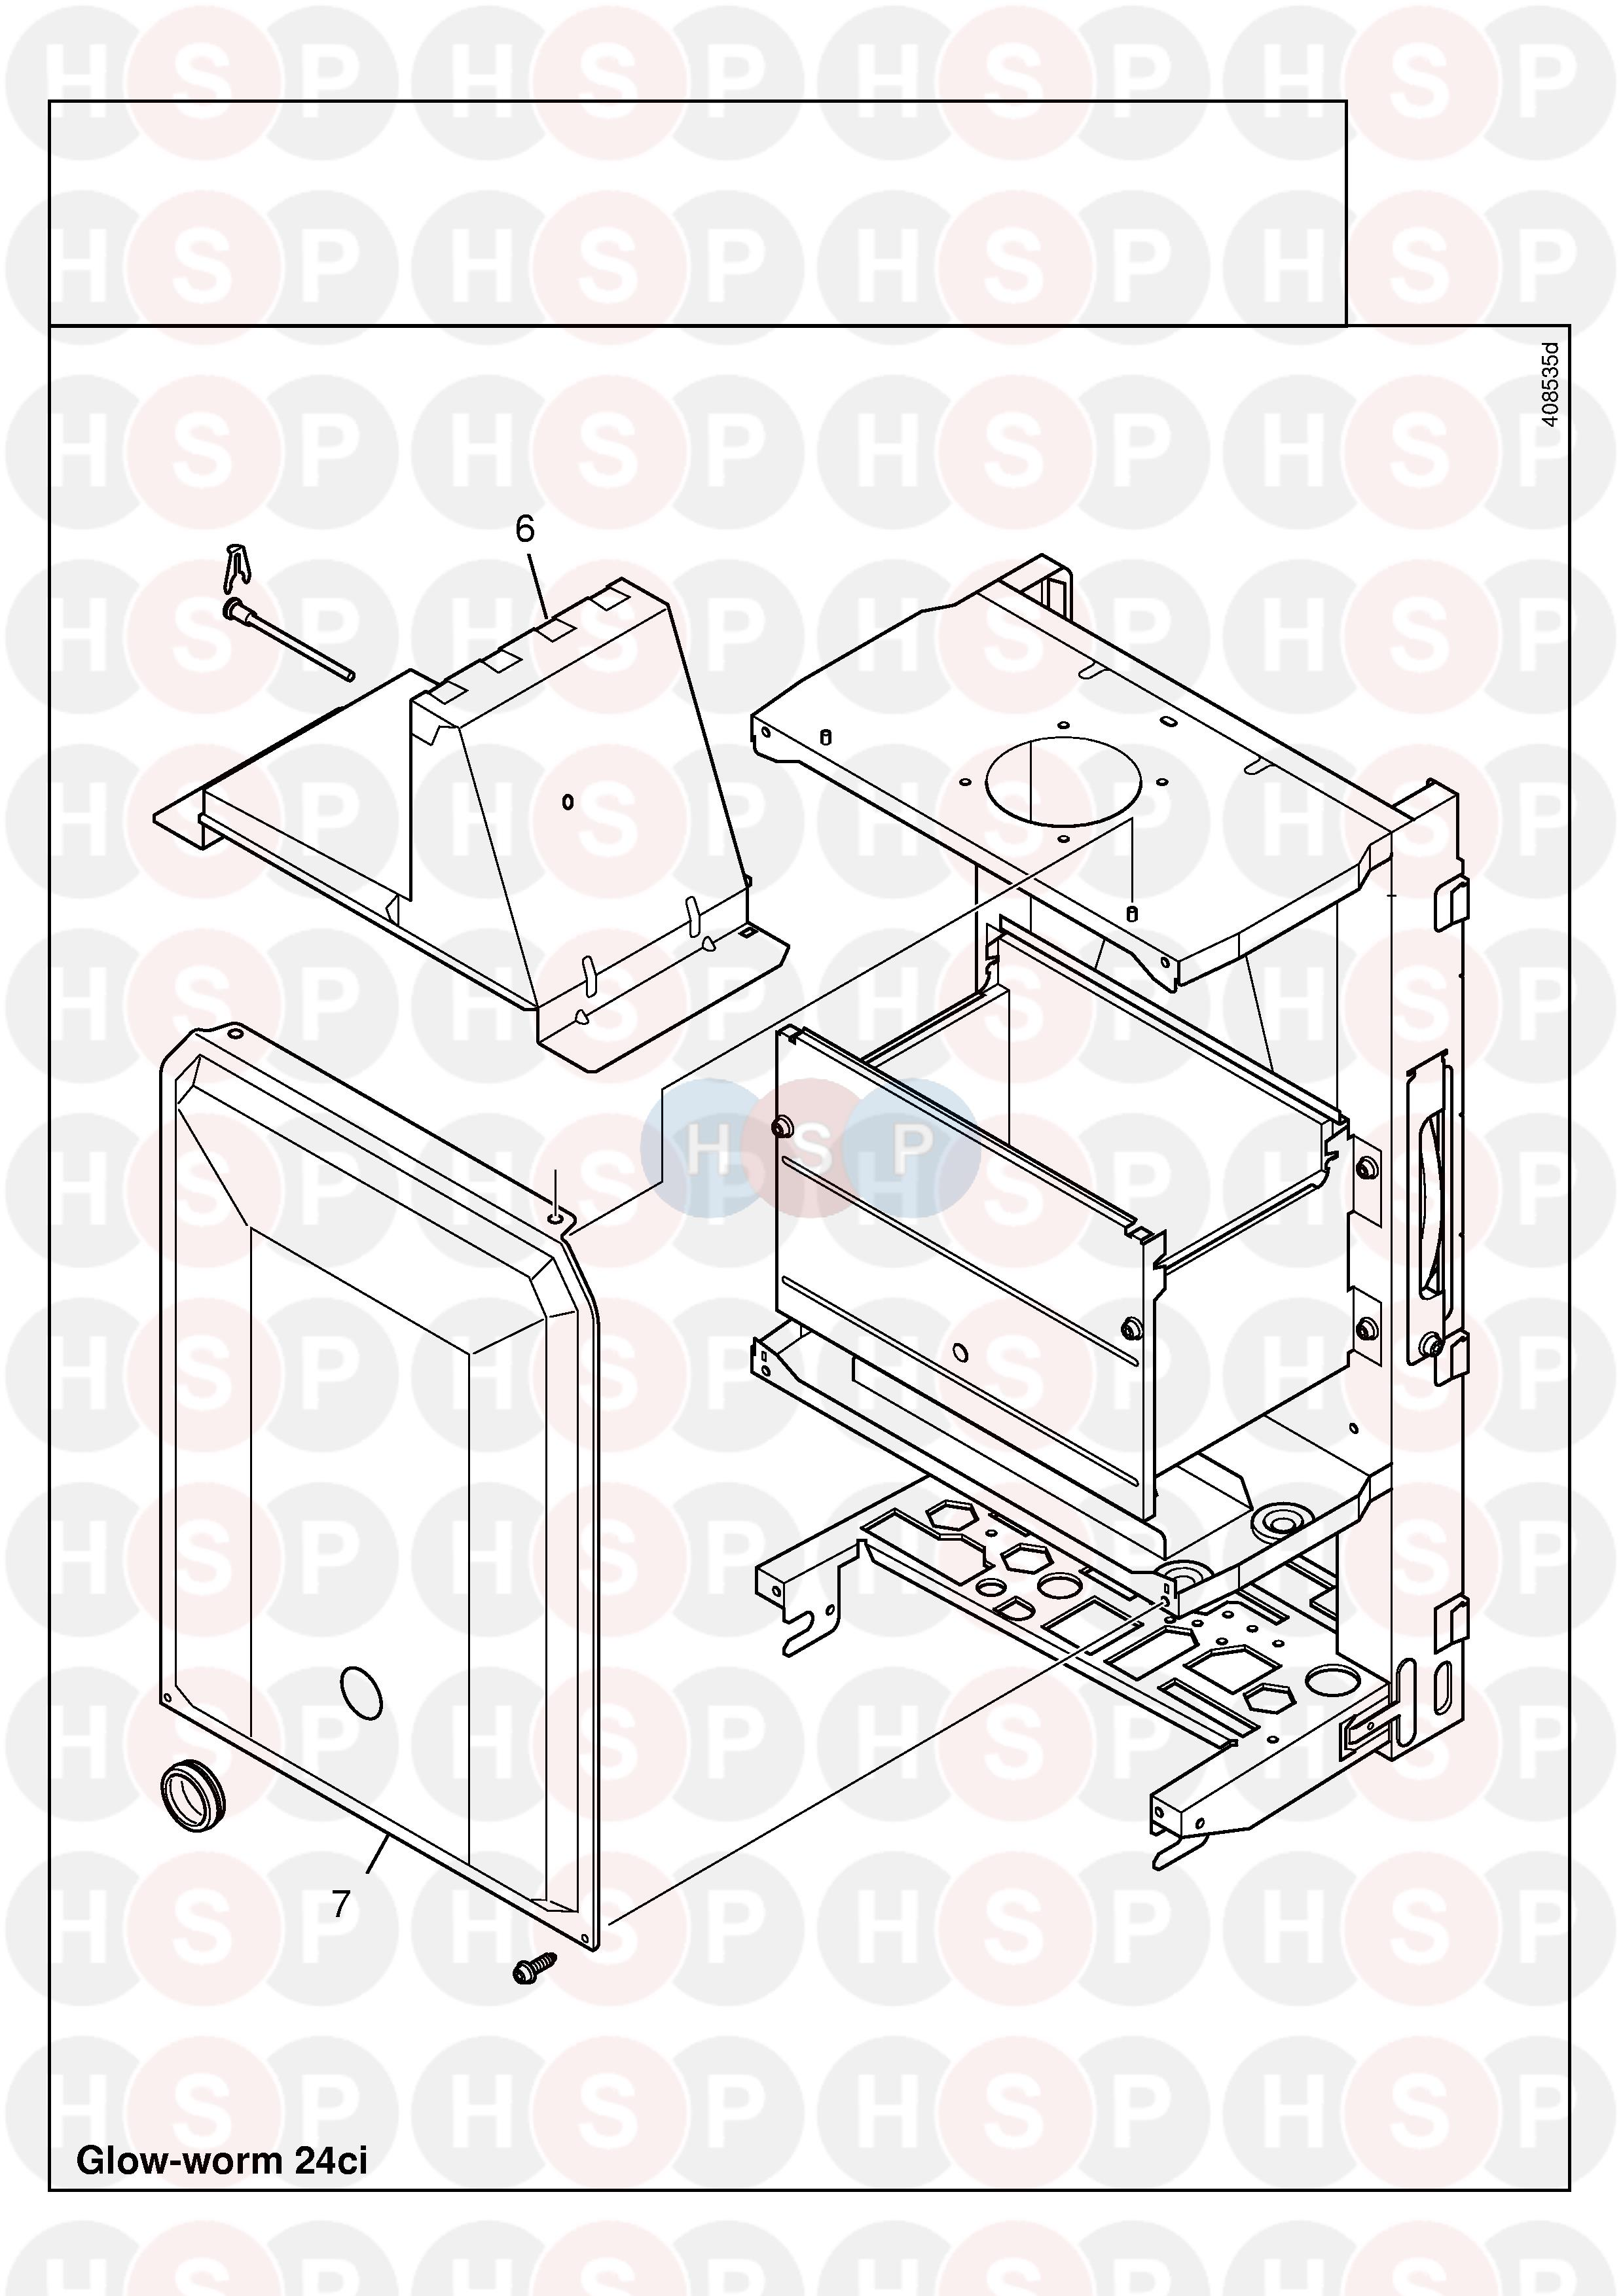 Glowworm GLOWWORM 24CI (CASING 2) Diagram | Heating Spare Parts